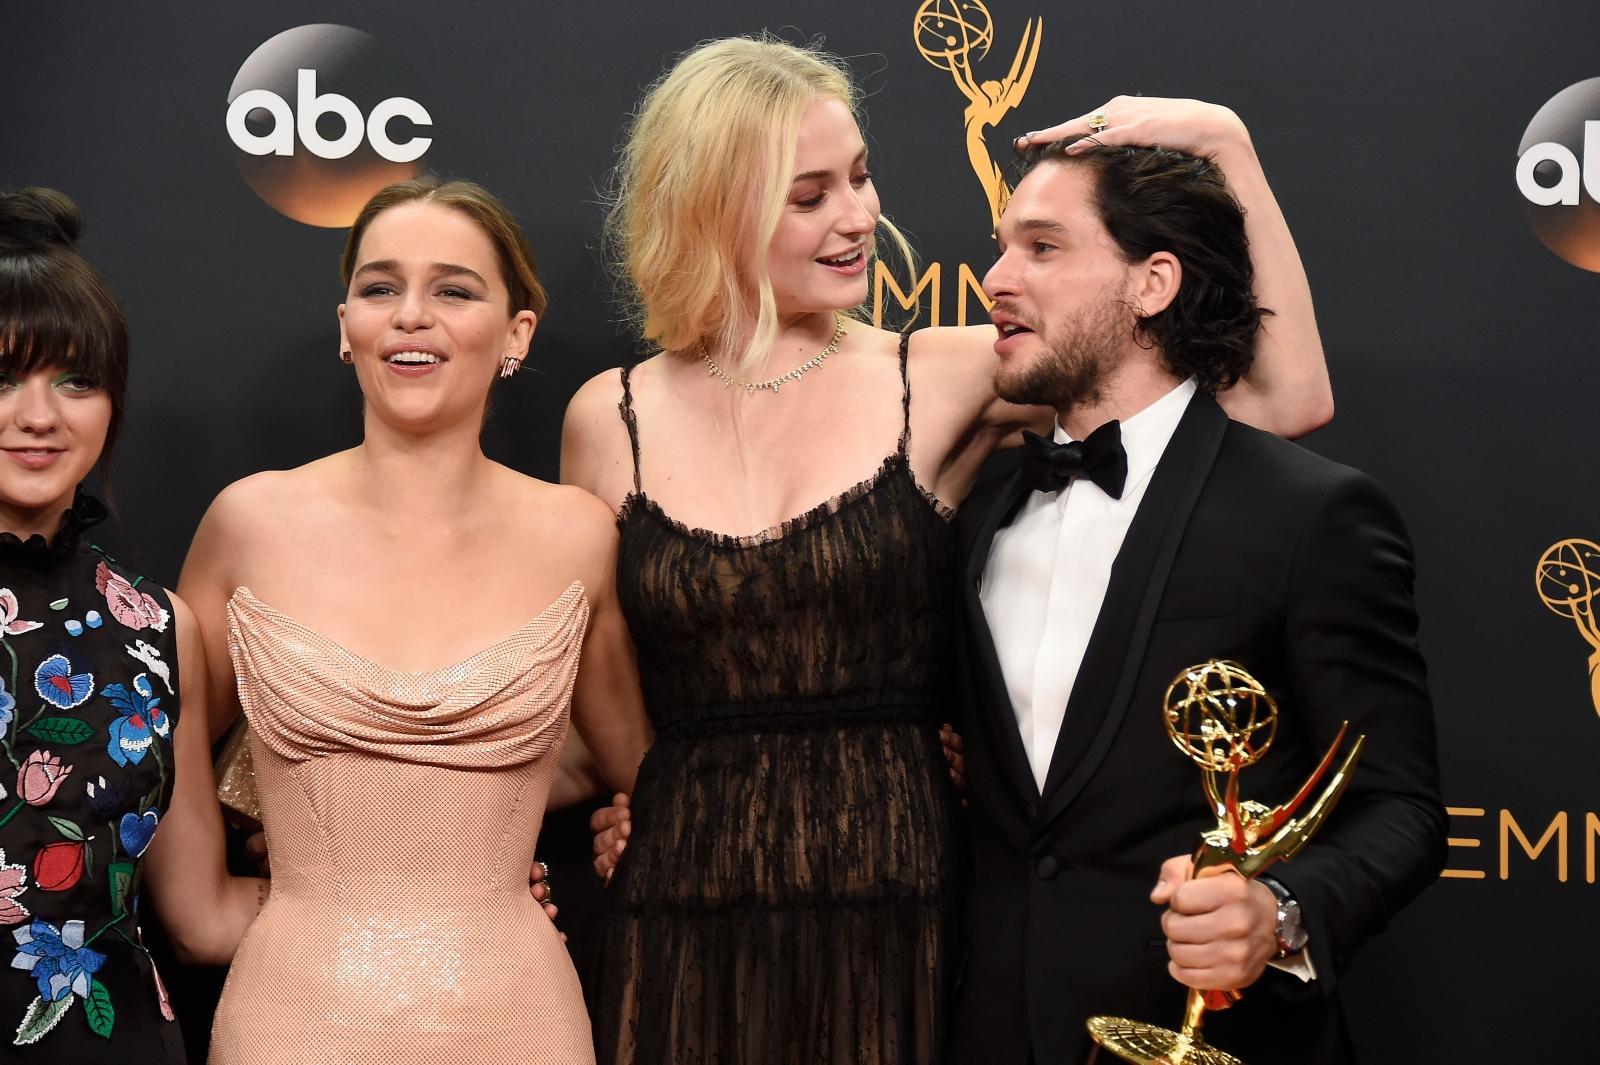 Game of Thrones Emilia Clarke and Sophie Turner